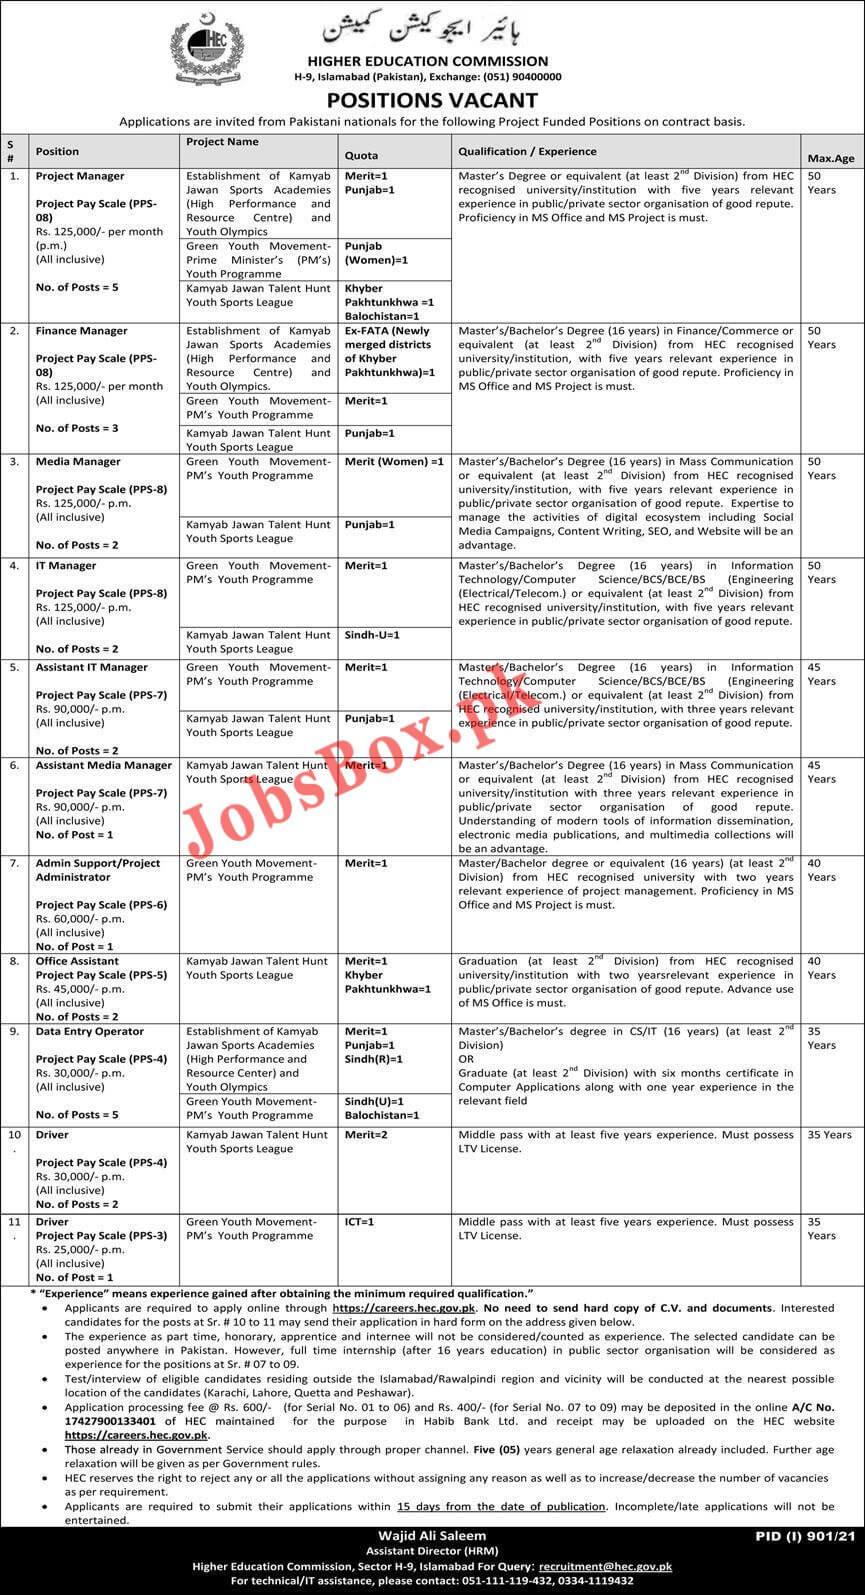 HEC Jobs 2021 Apply Online - Higher Education Commission HEC Jobs 2021 in Pakistan - HEC Careers